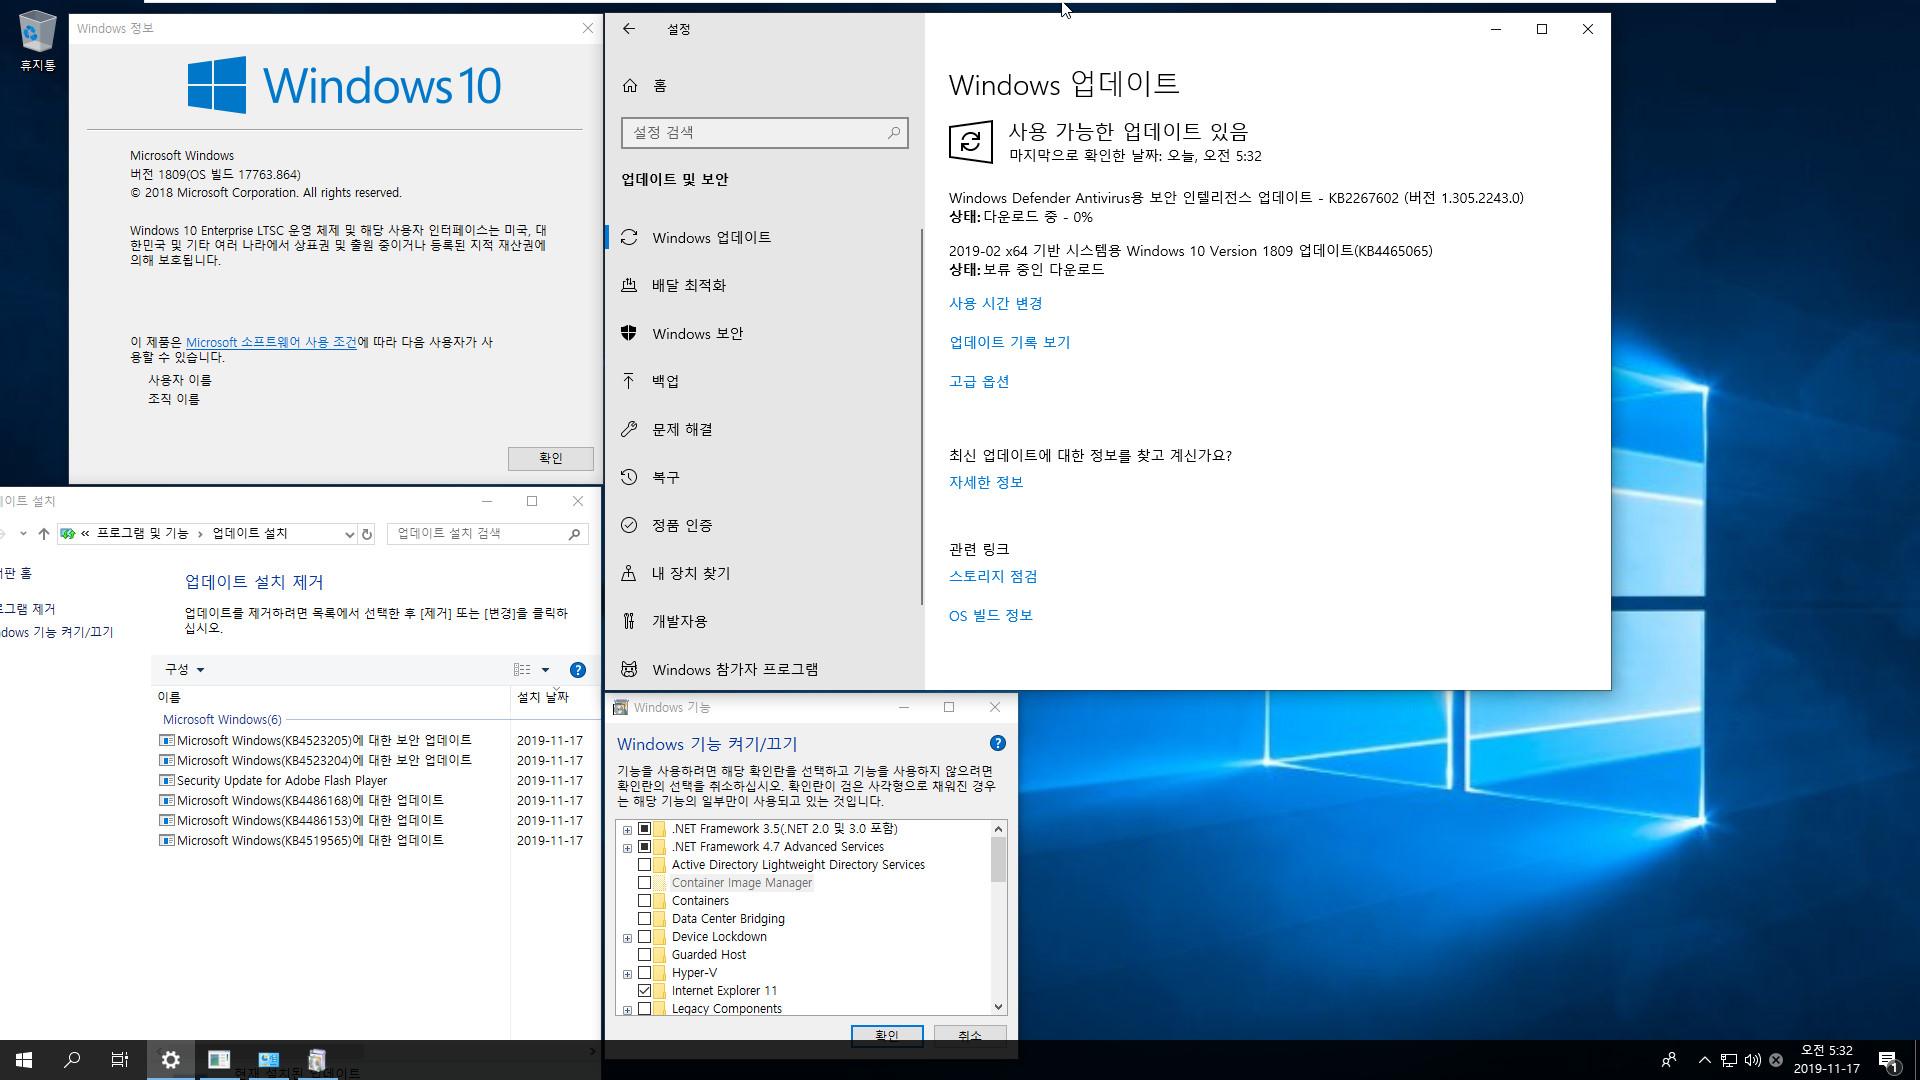 Windows 10 버전 1809 누적 업데이트 KB4523205 (OS 빌드 17763.864) [2019-11-12 일자] 중에 LTSC 2019 통합중 입니다 - 64비트 확인 2019-11-17_053232.jpg